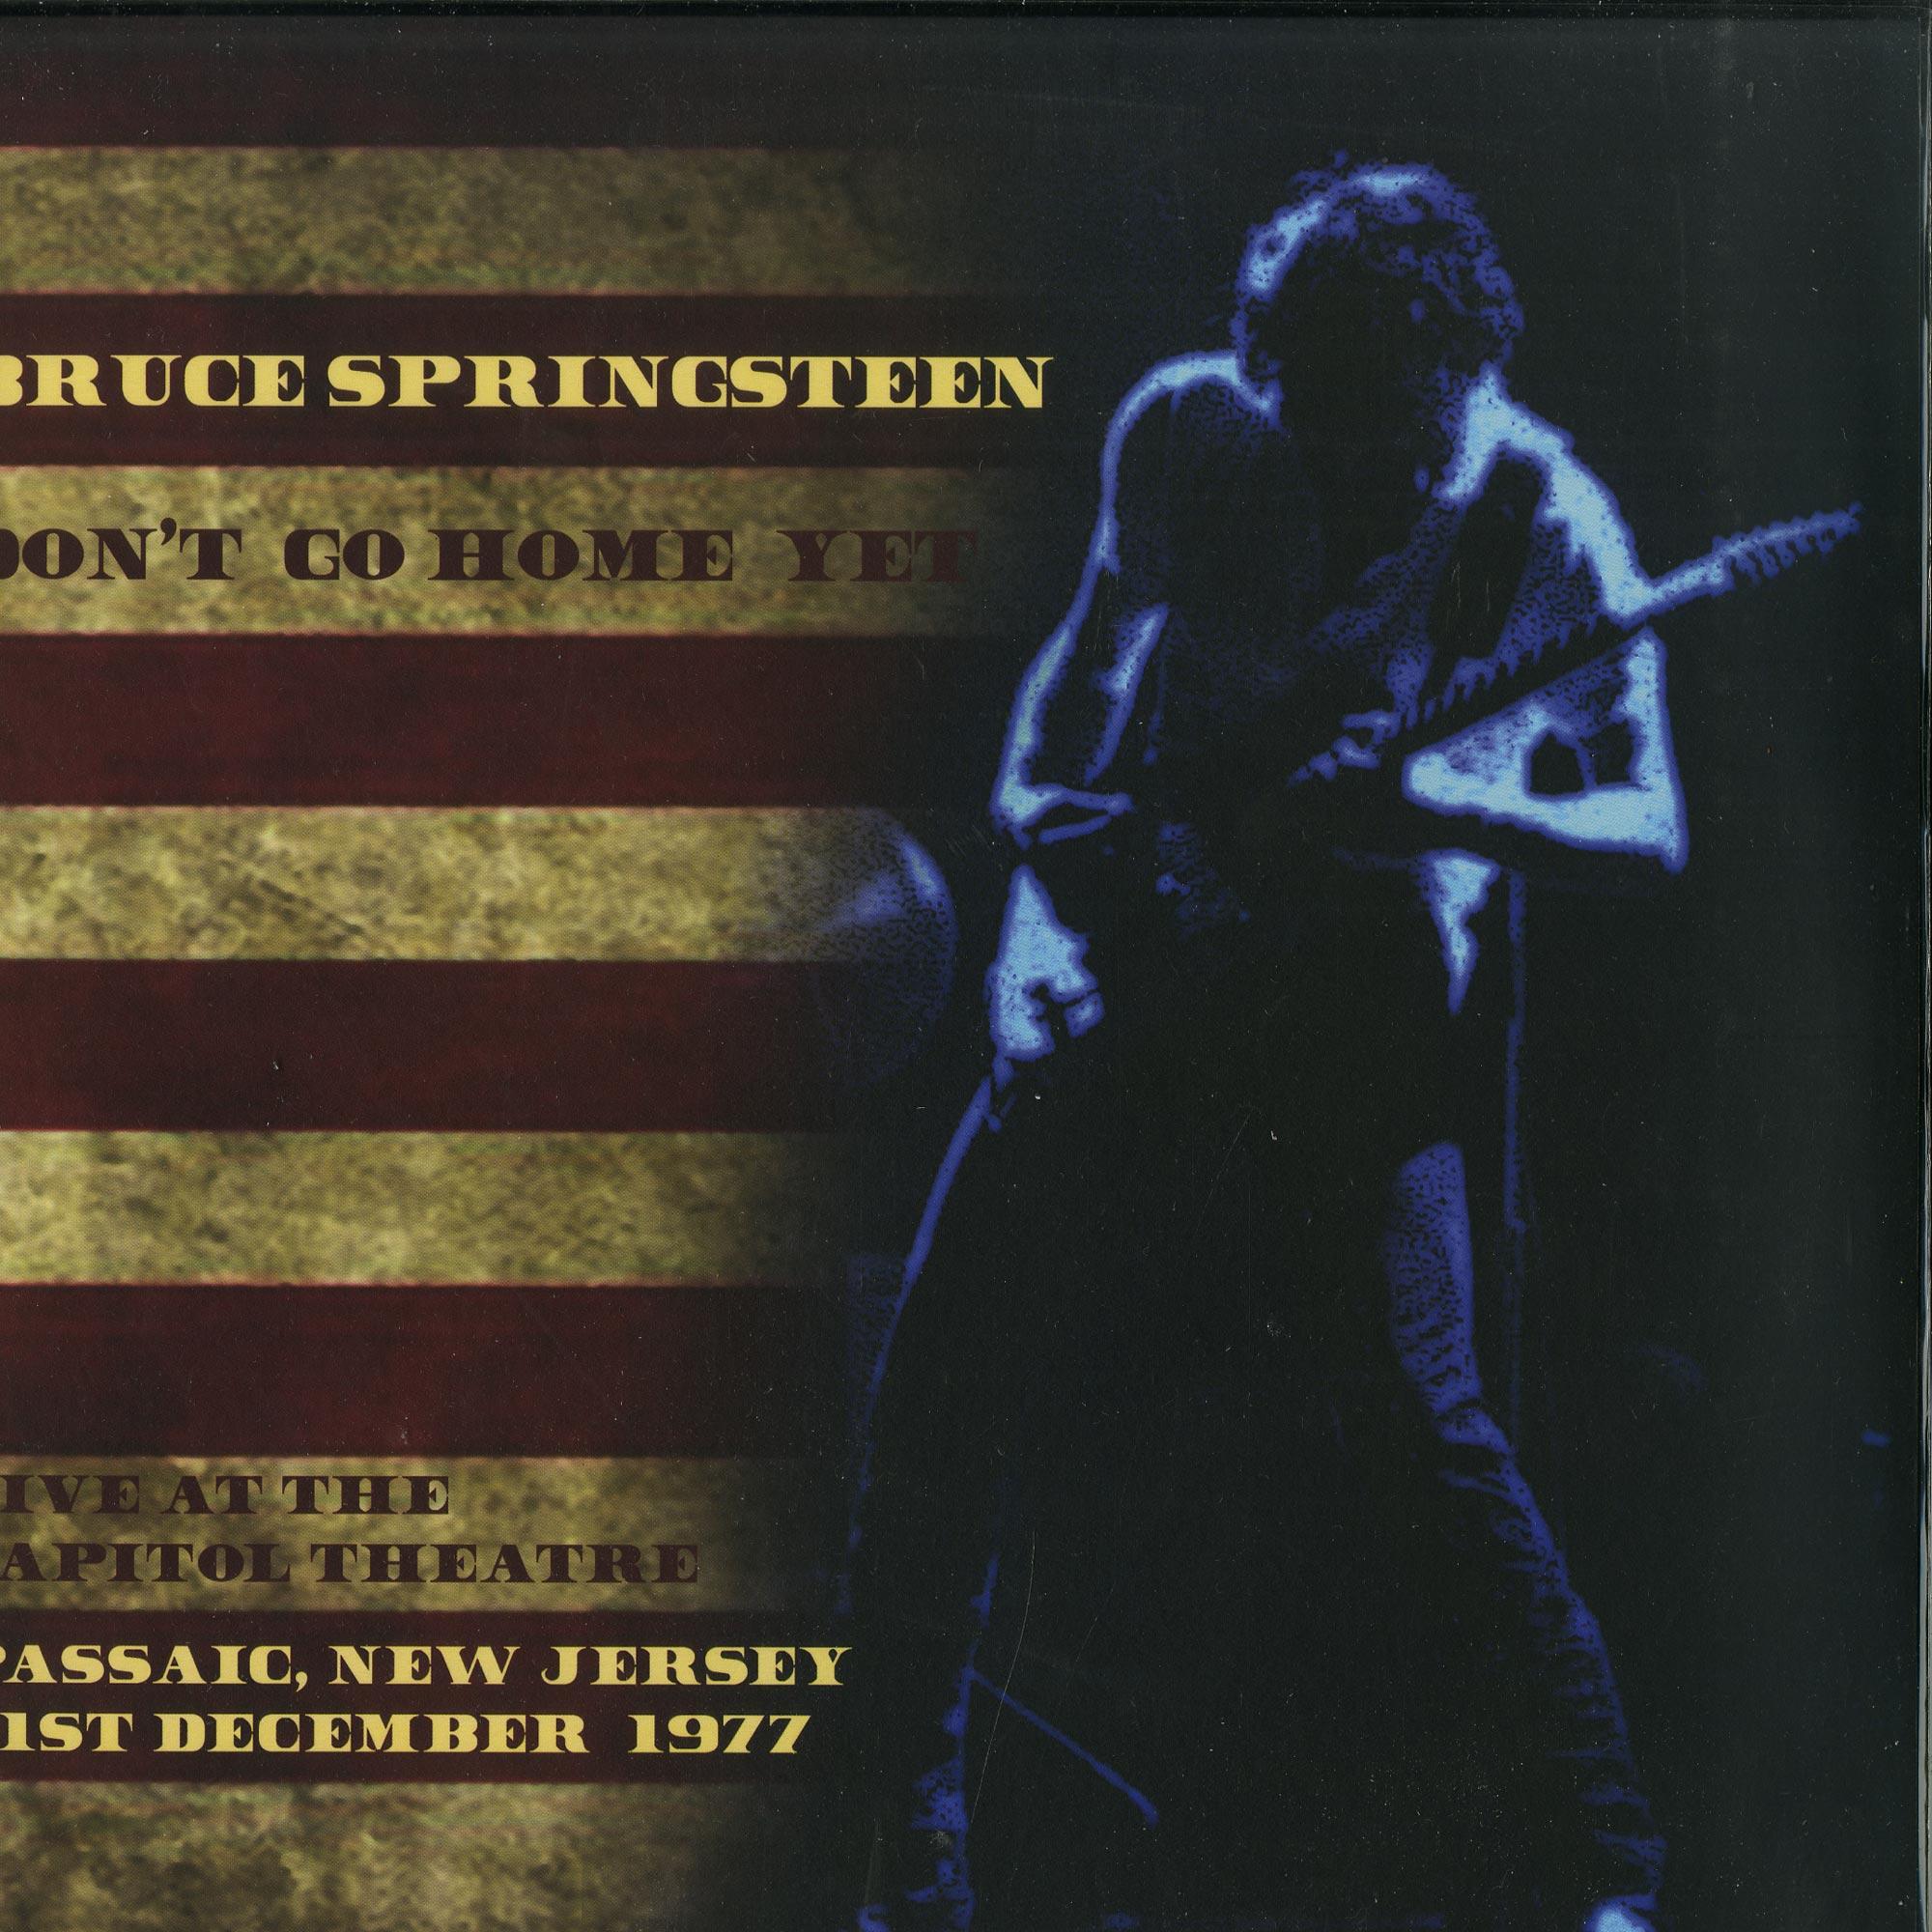 Bruce Springsteen - DONT GO HOME YET